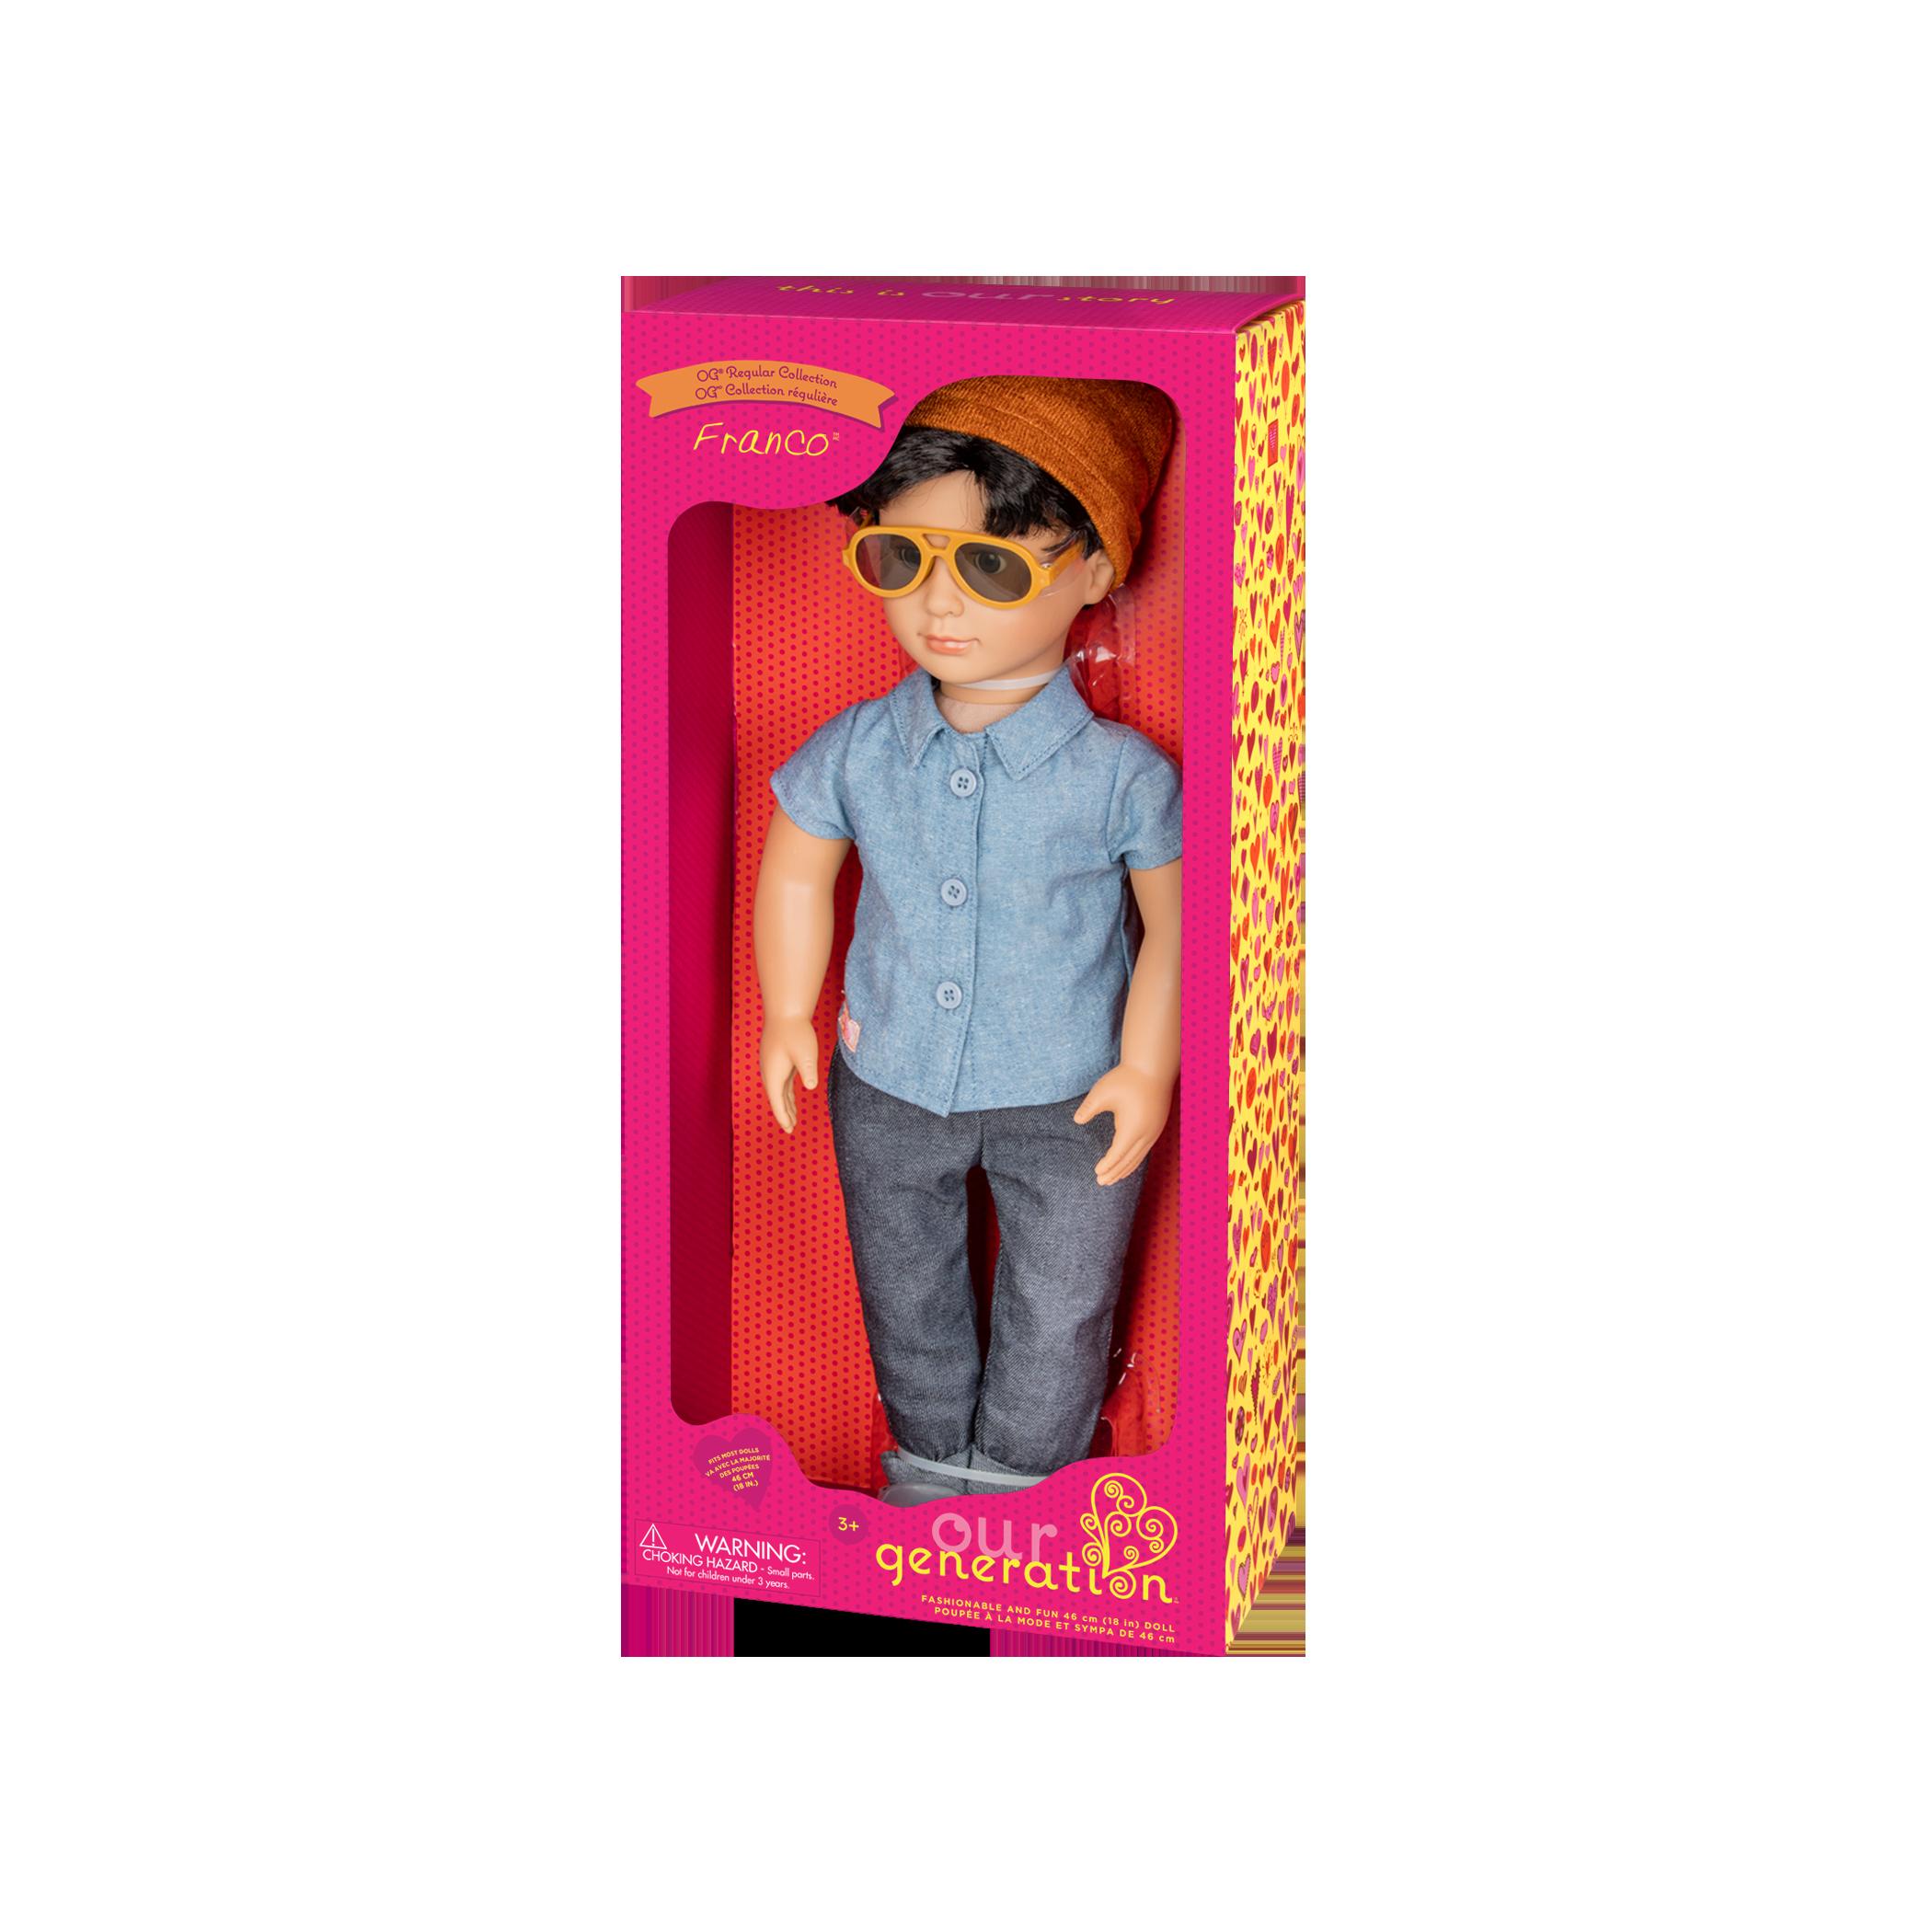 Franco Regular 18-inch Boy Doll in packaging